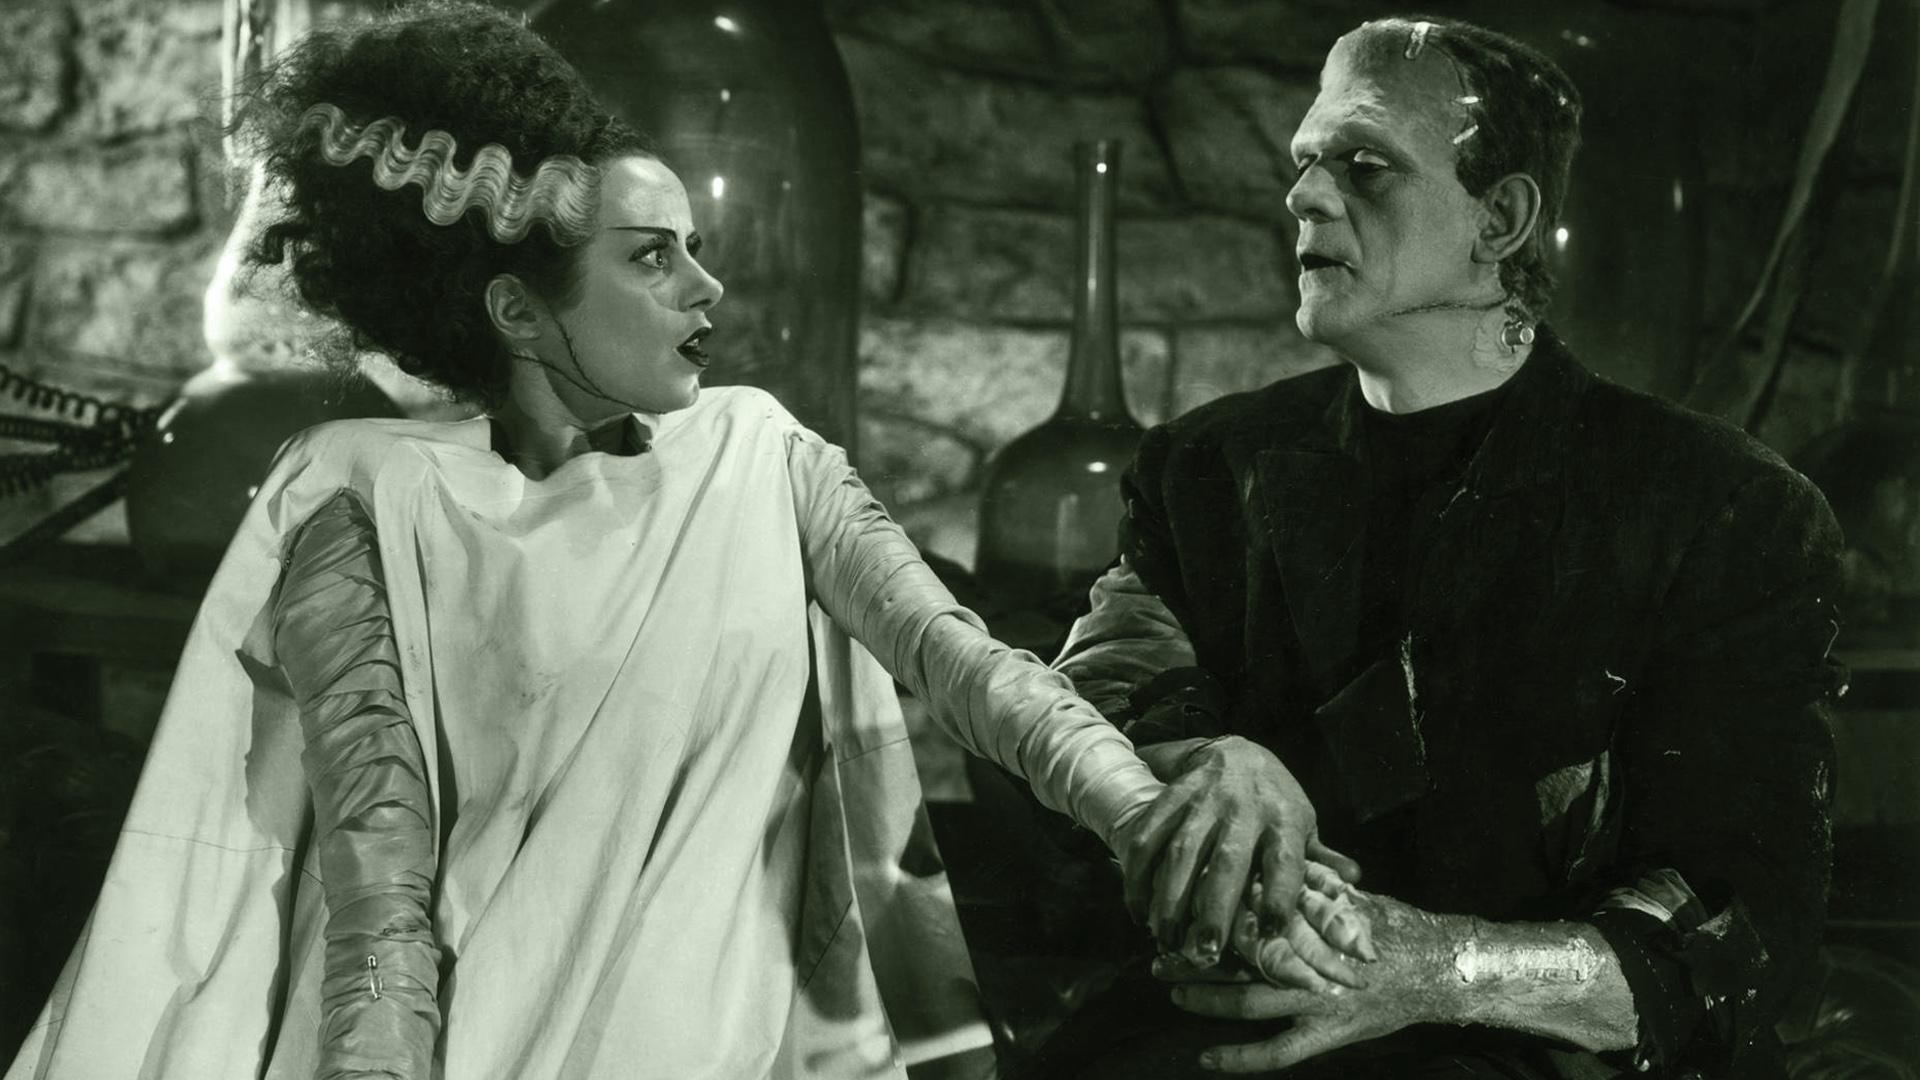 Frankenstein and Bride Wallpapers Frankenstein and Bride Myspace 1920x1080